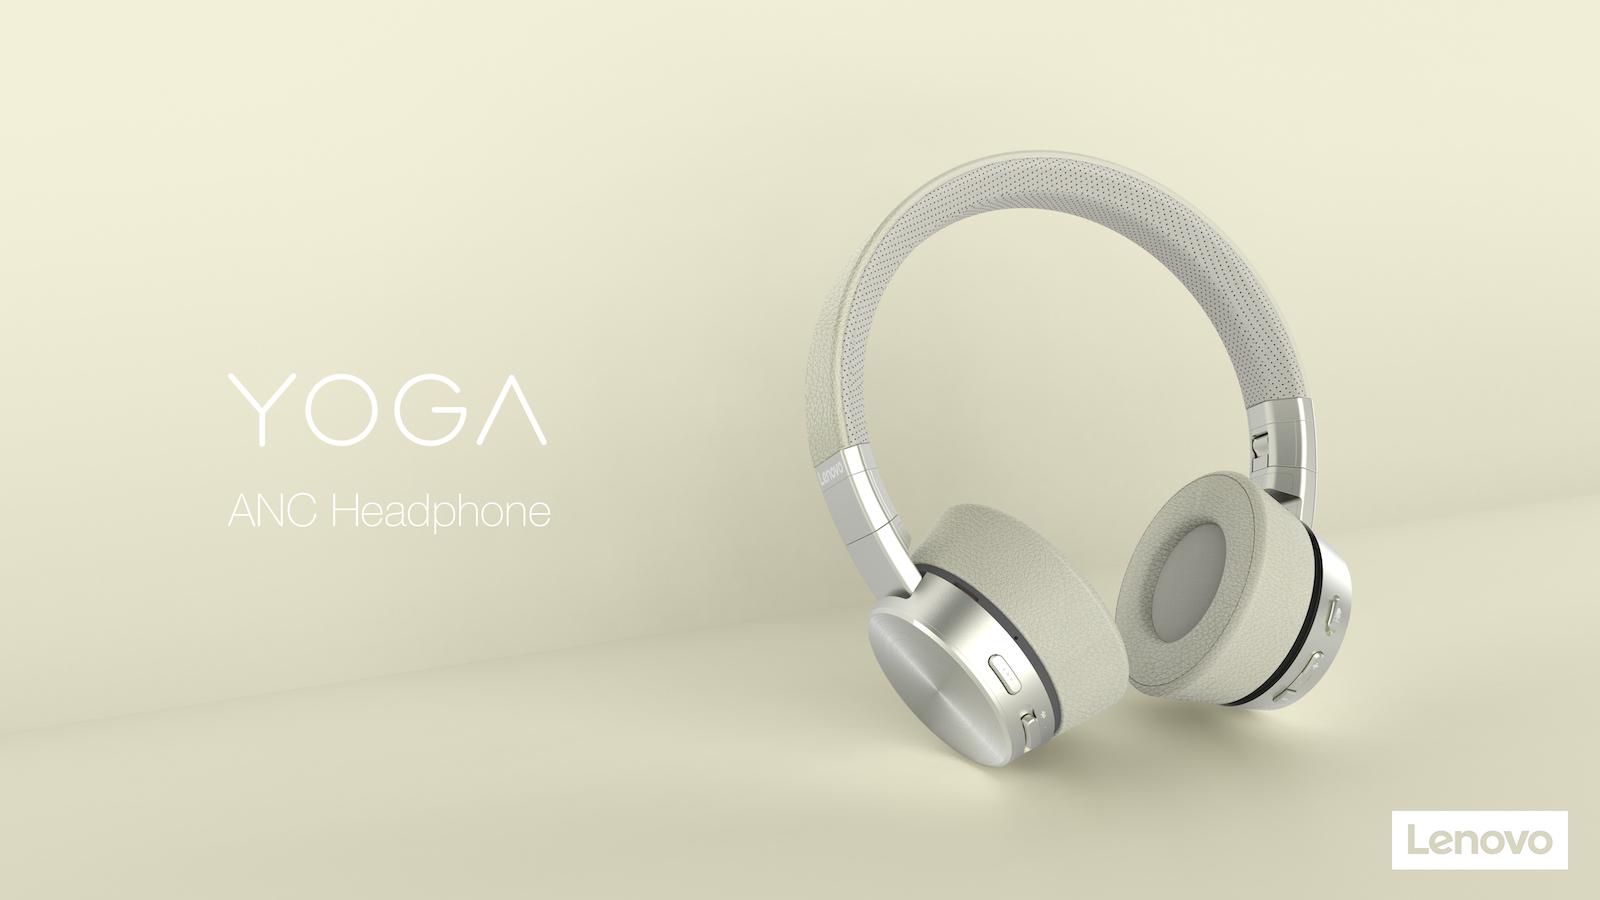 Lenovo Yoga ANC Headphones image 1